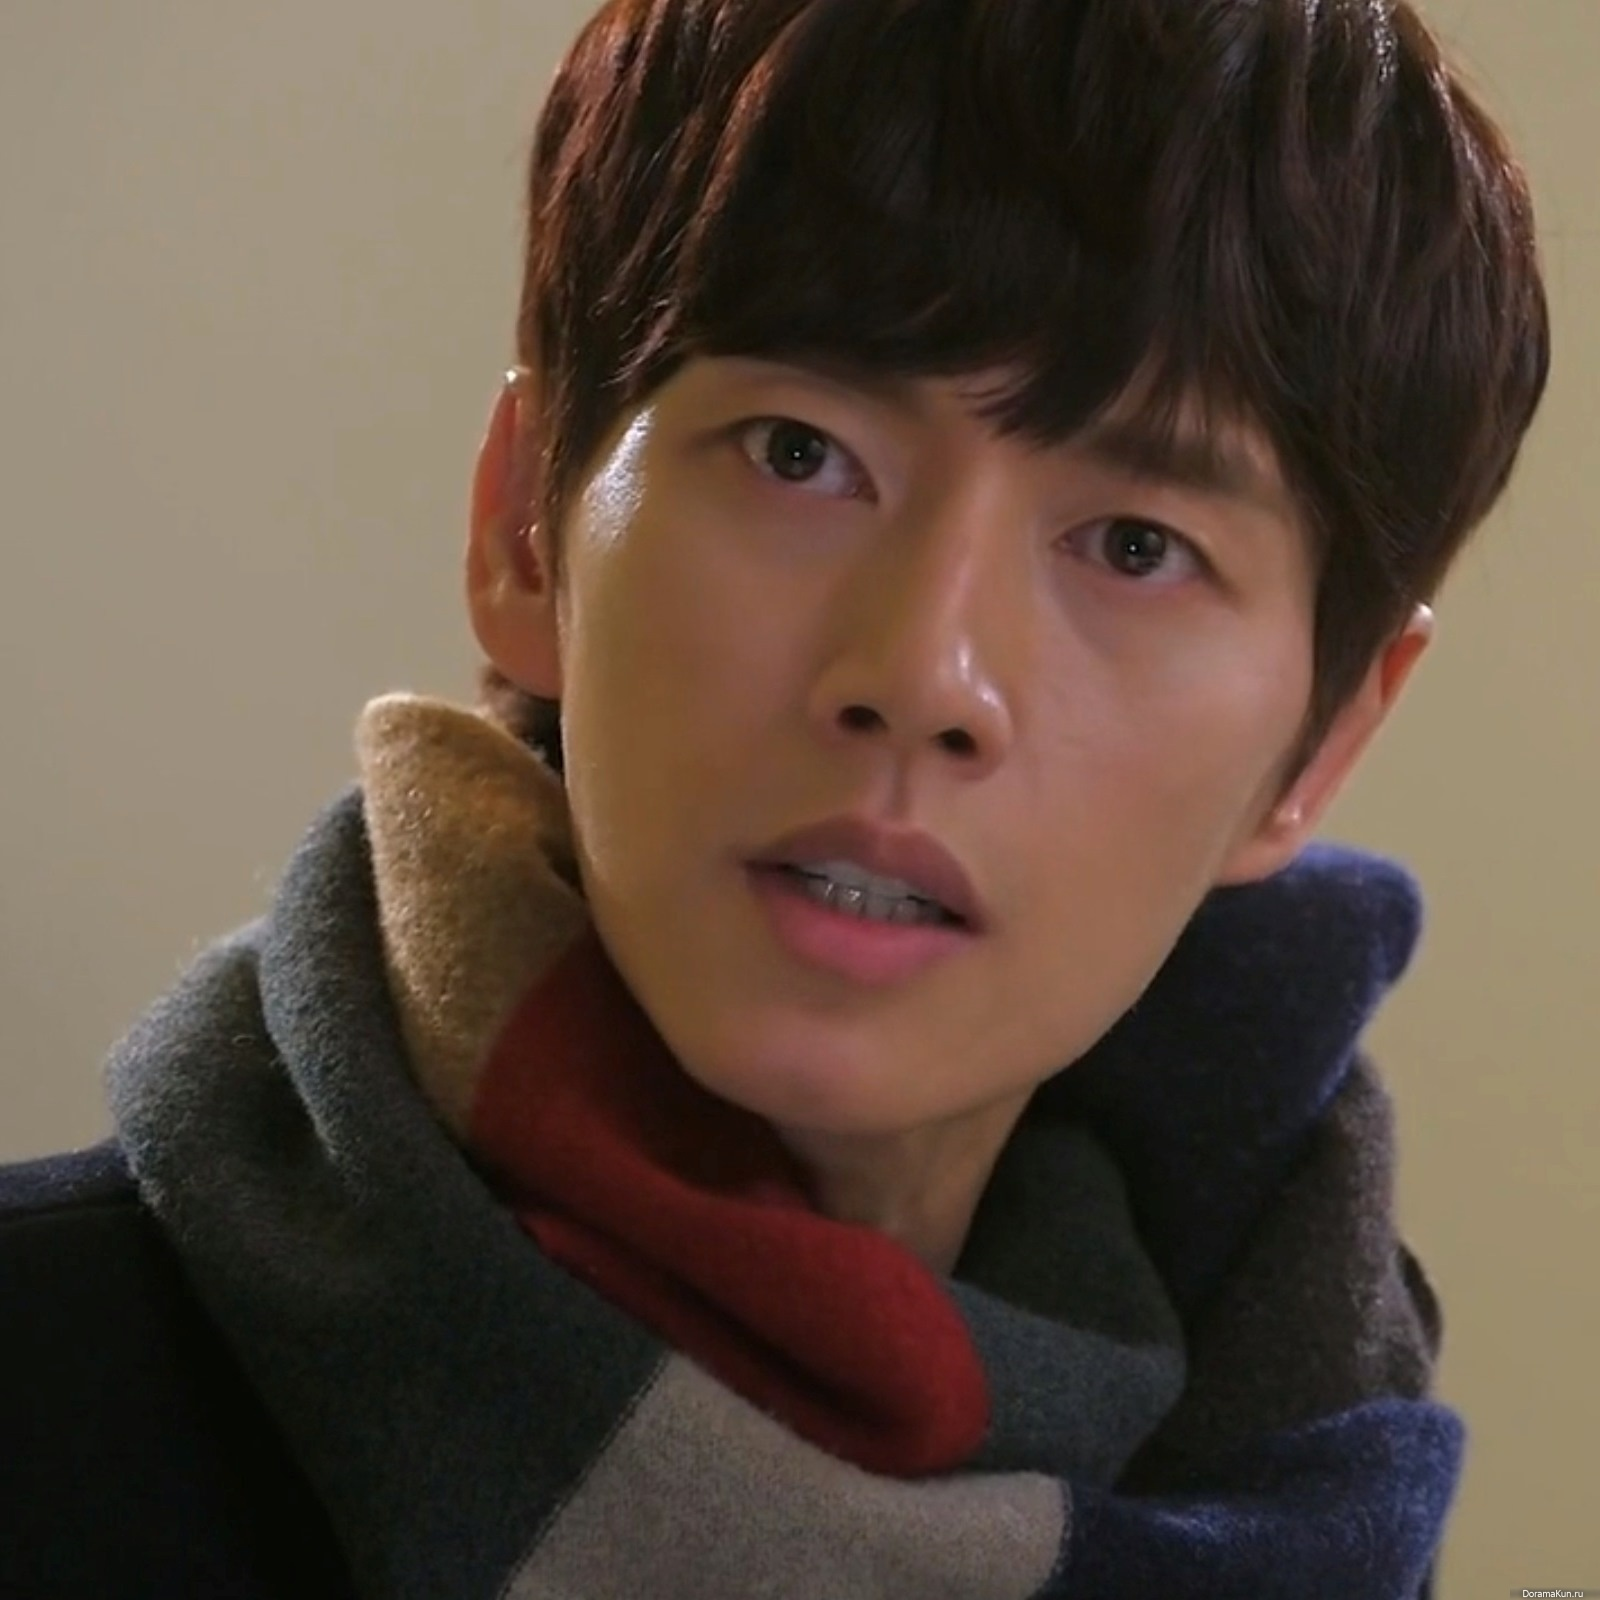 Пак Хэ Чжин | Park Hae Jin | наш Маняш - Страница 8 Hee-Kyung-Intro-1600